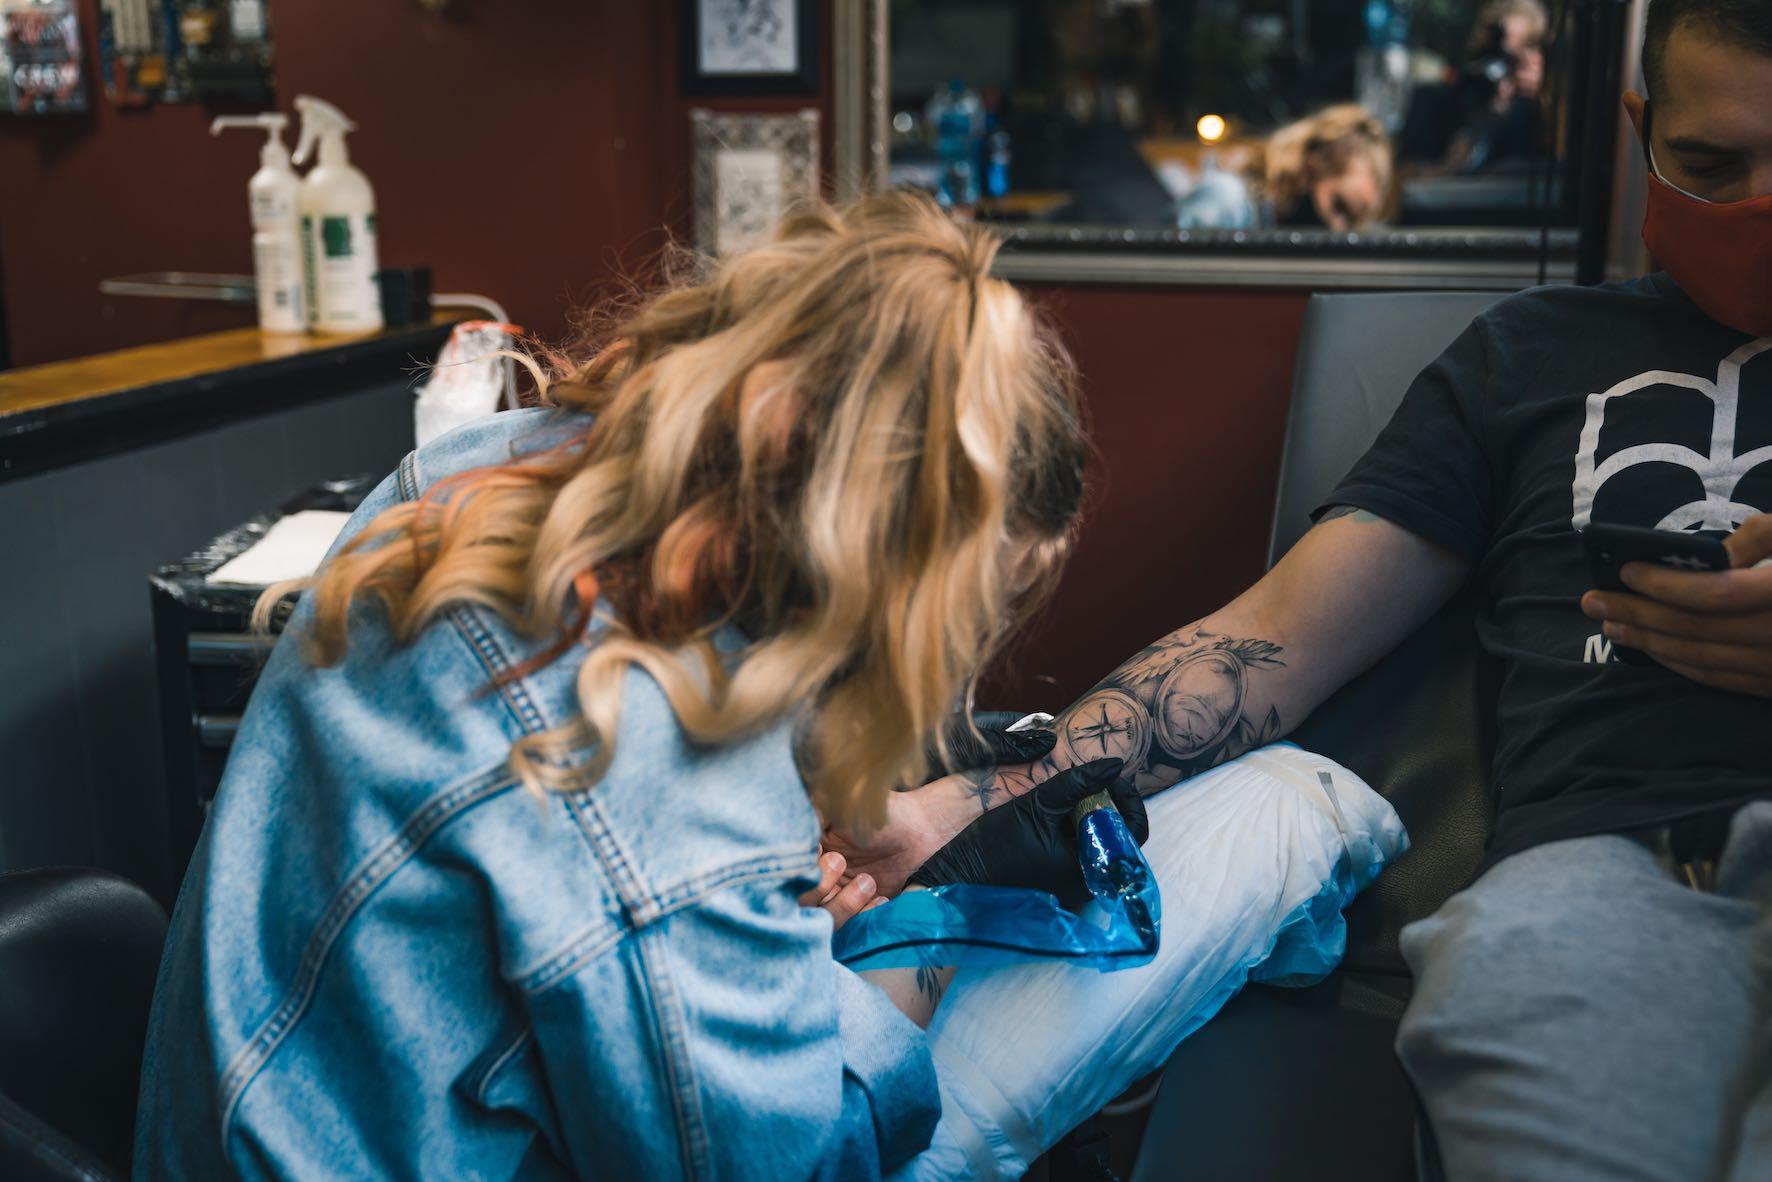 Meet Megan Fourie as our Featured Tattoo Artist